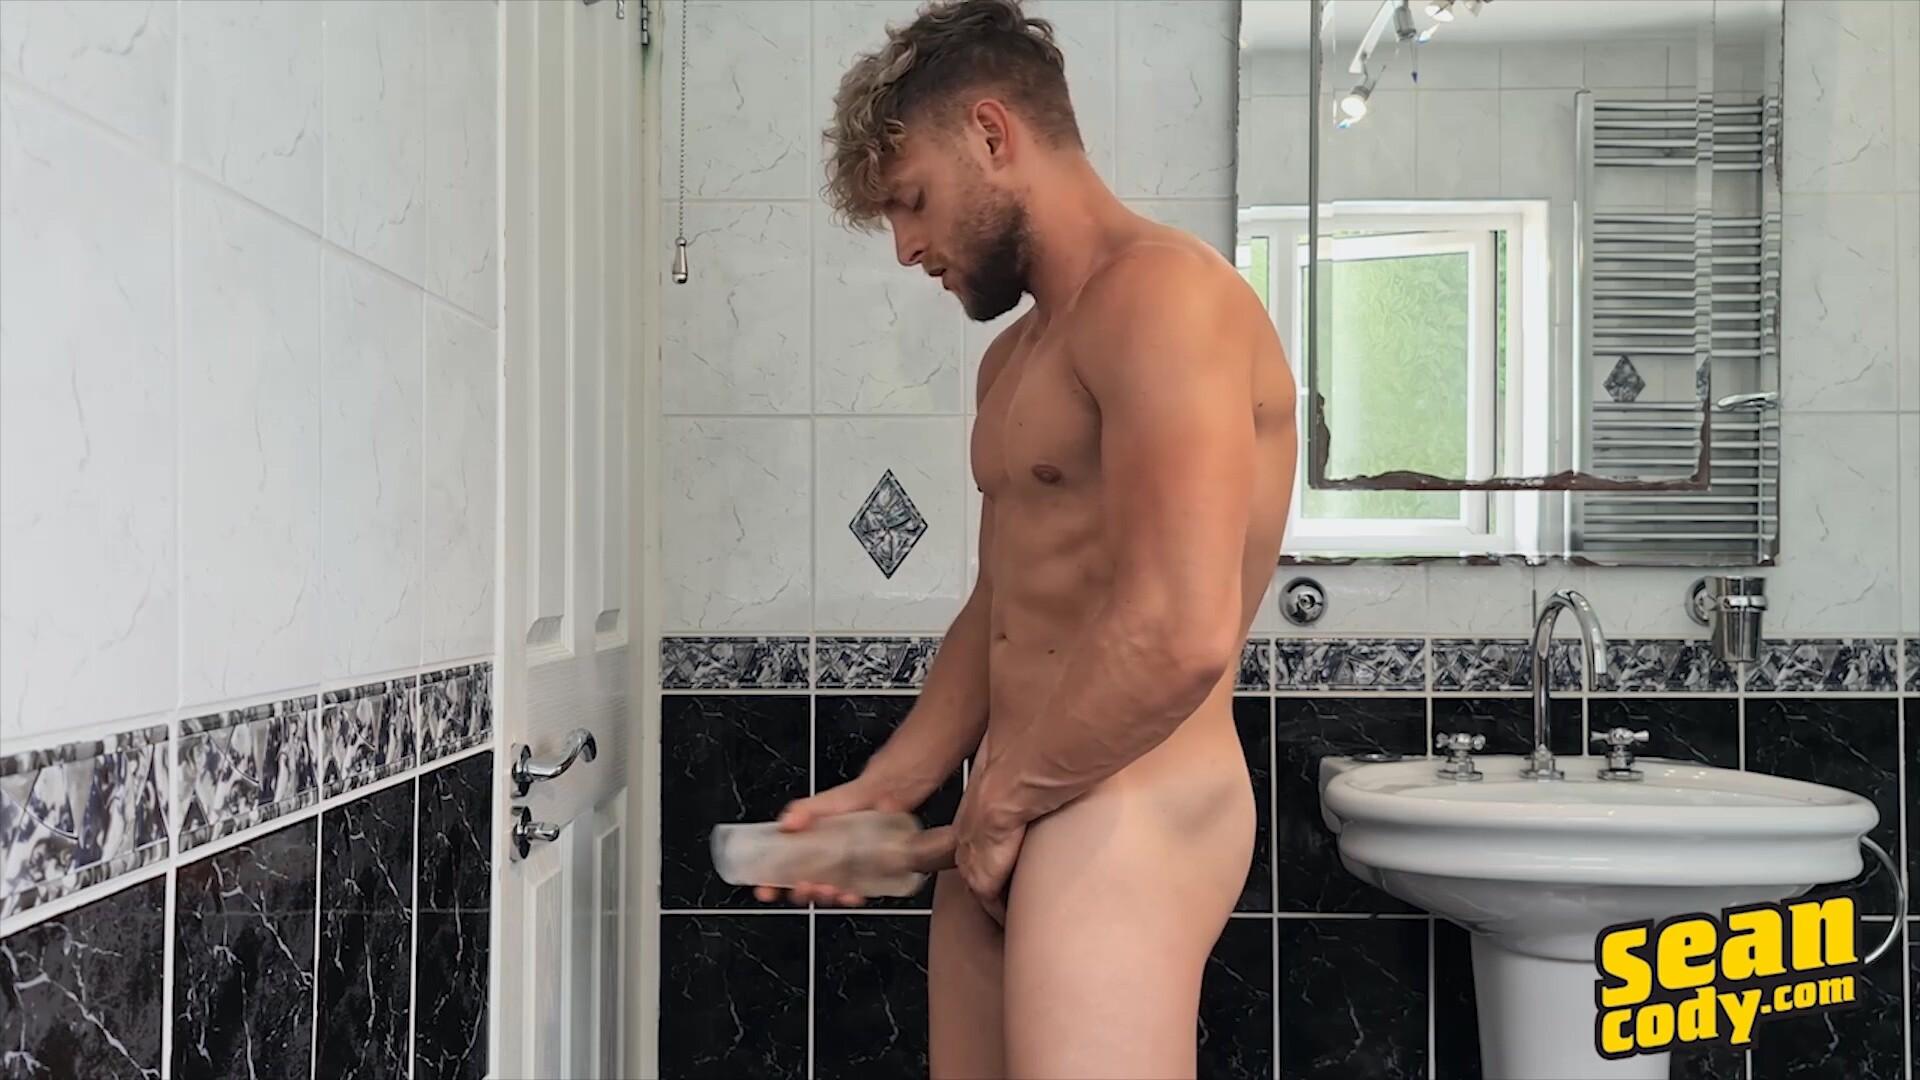 Sean Cody - Jake - Gay Movie